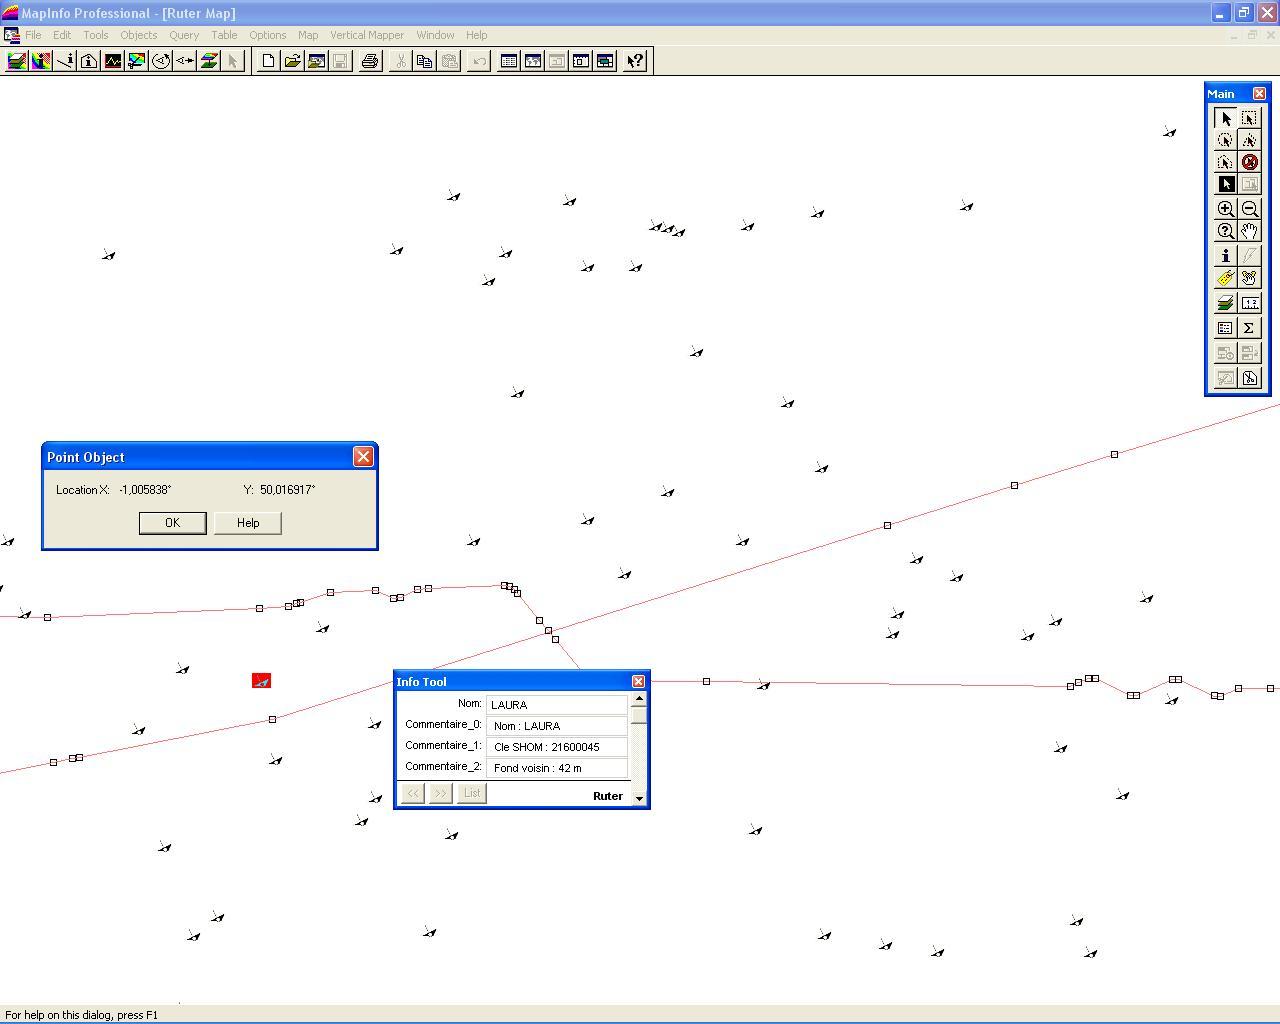 le logiciel vertical mapper